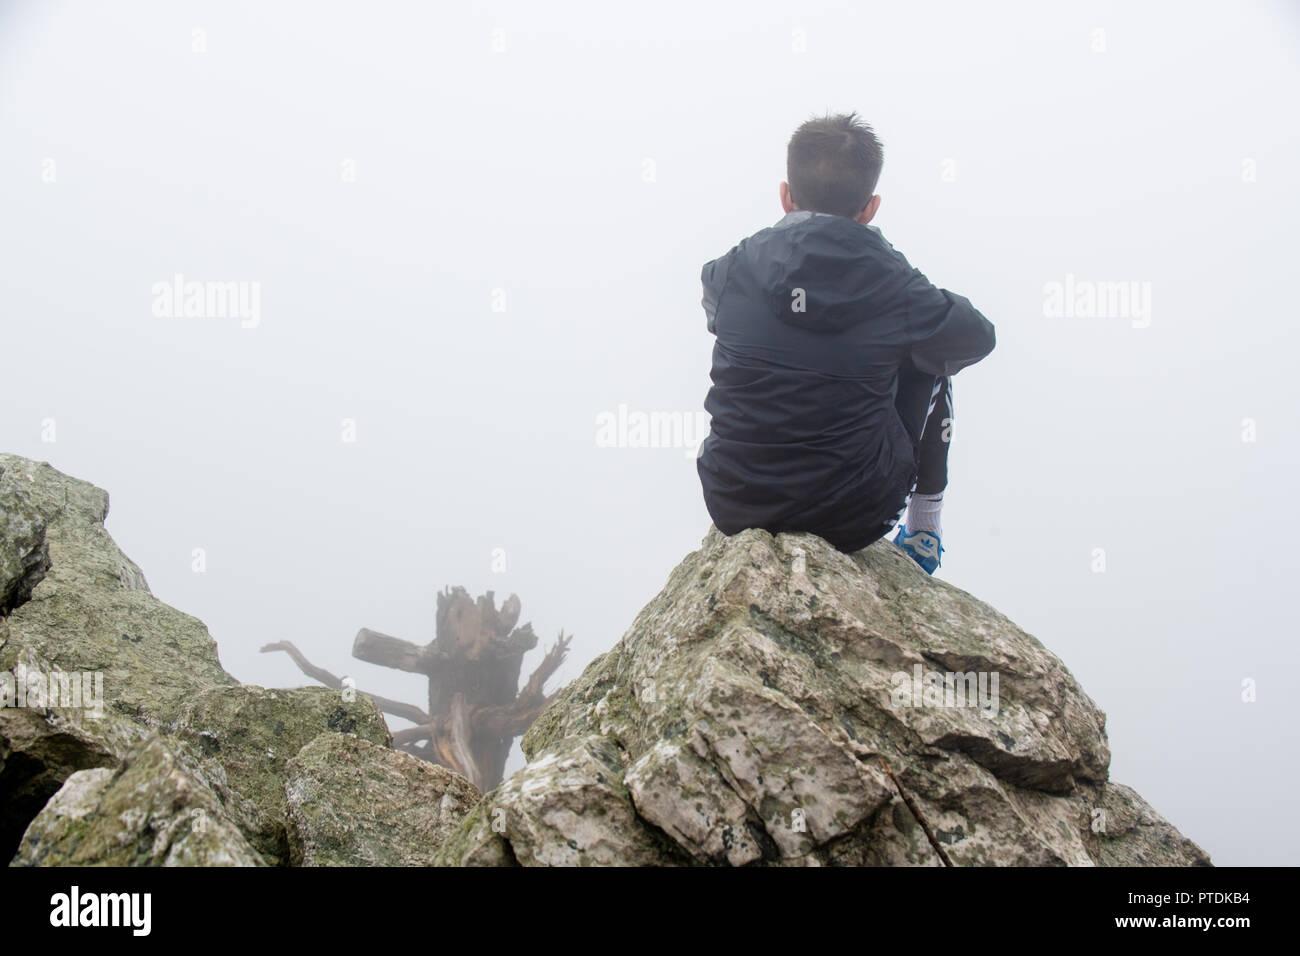 Teenager hiking / backpacking in the rain and dense fog on Hawk